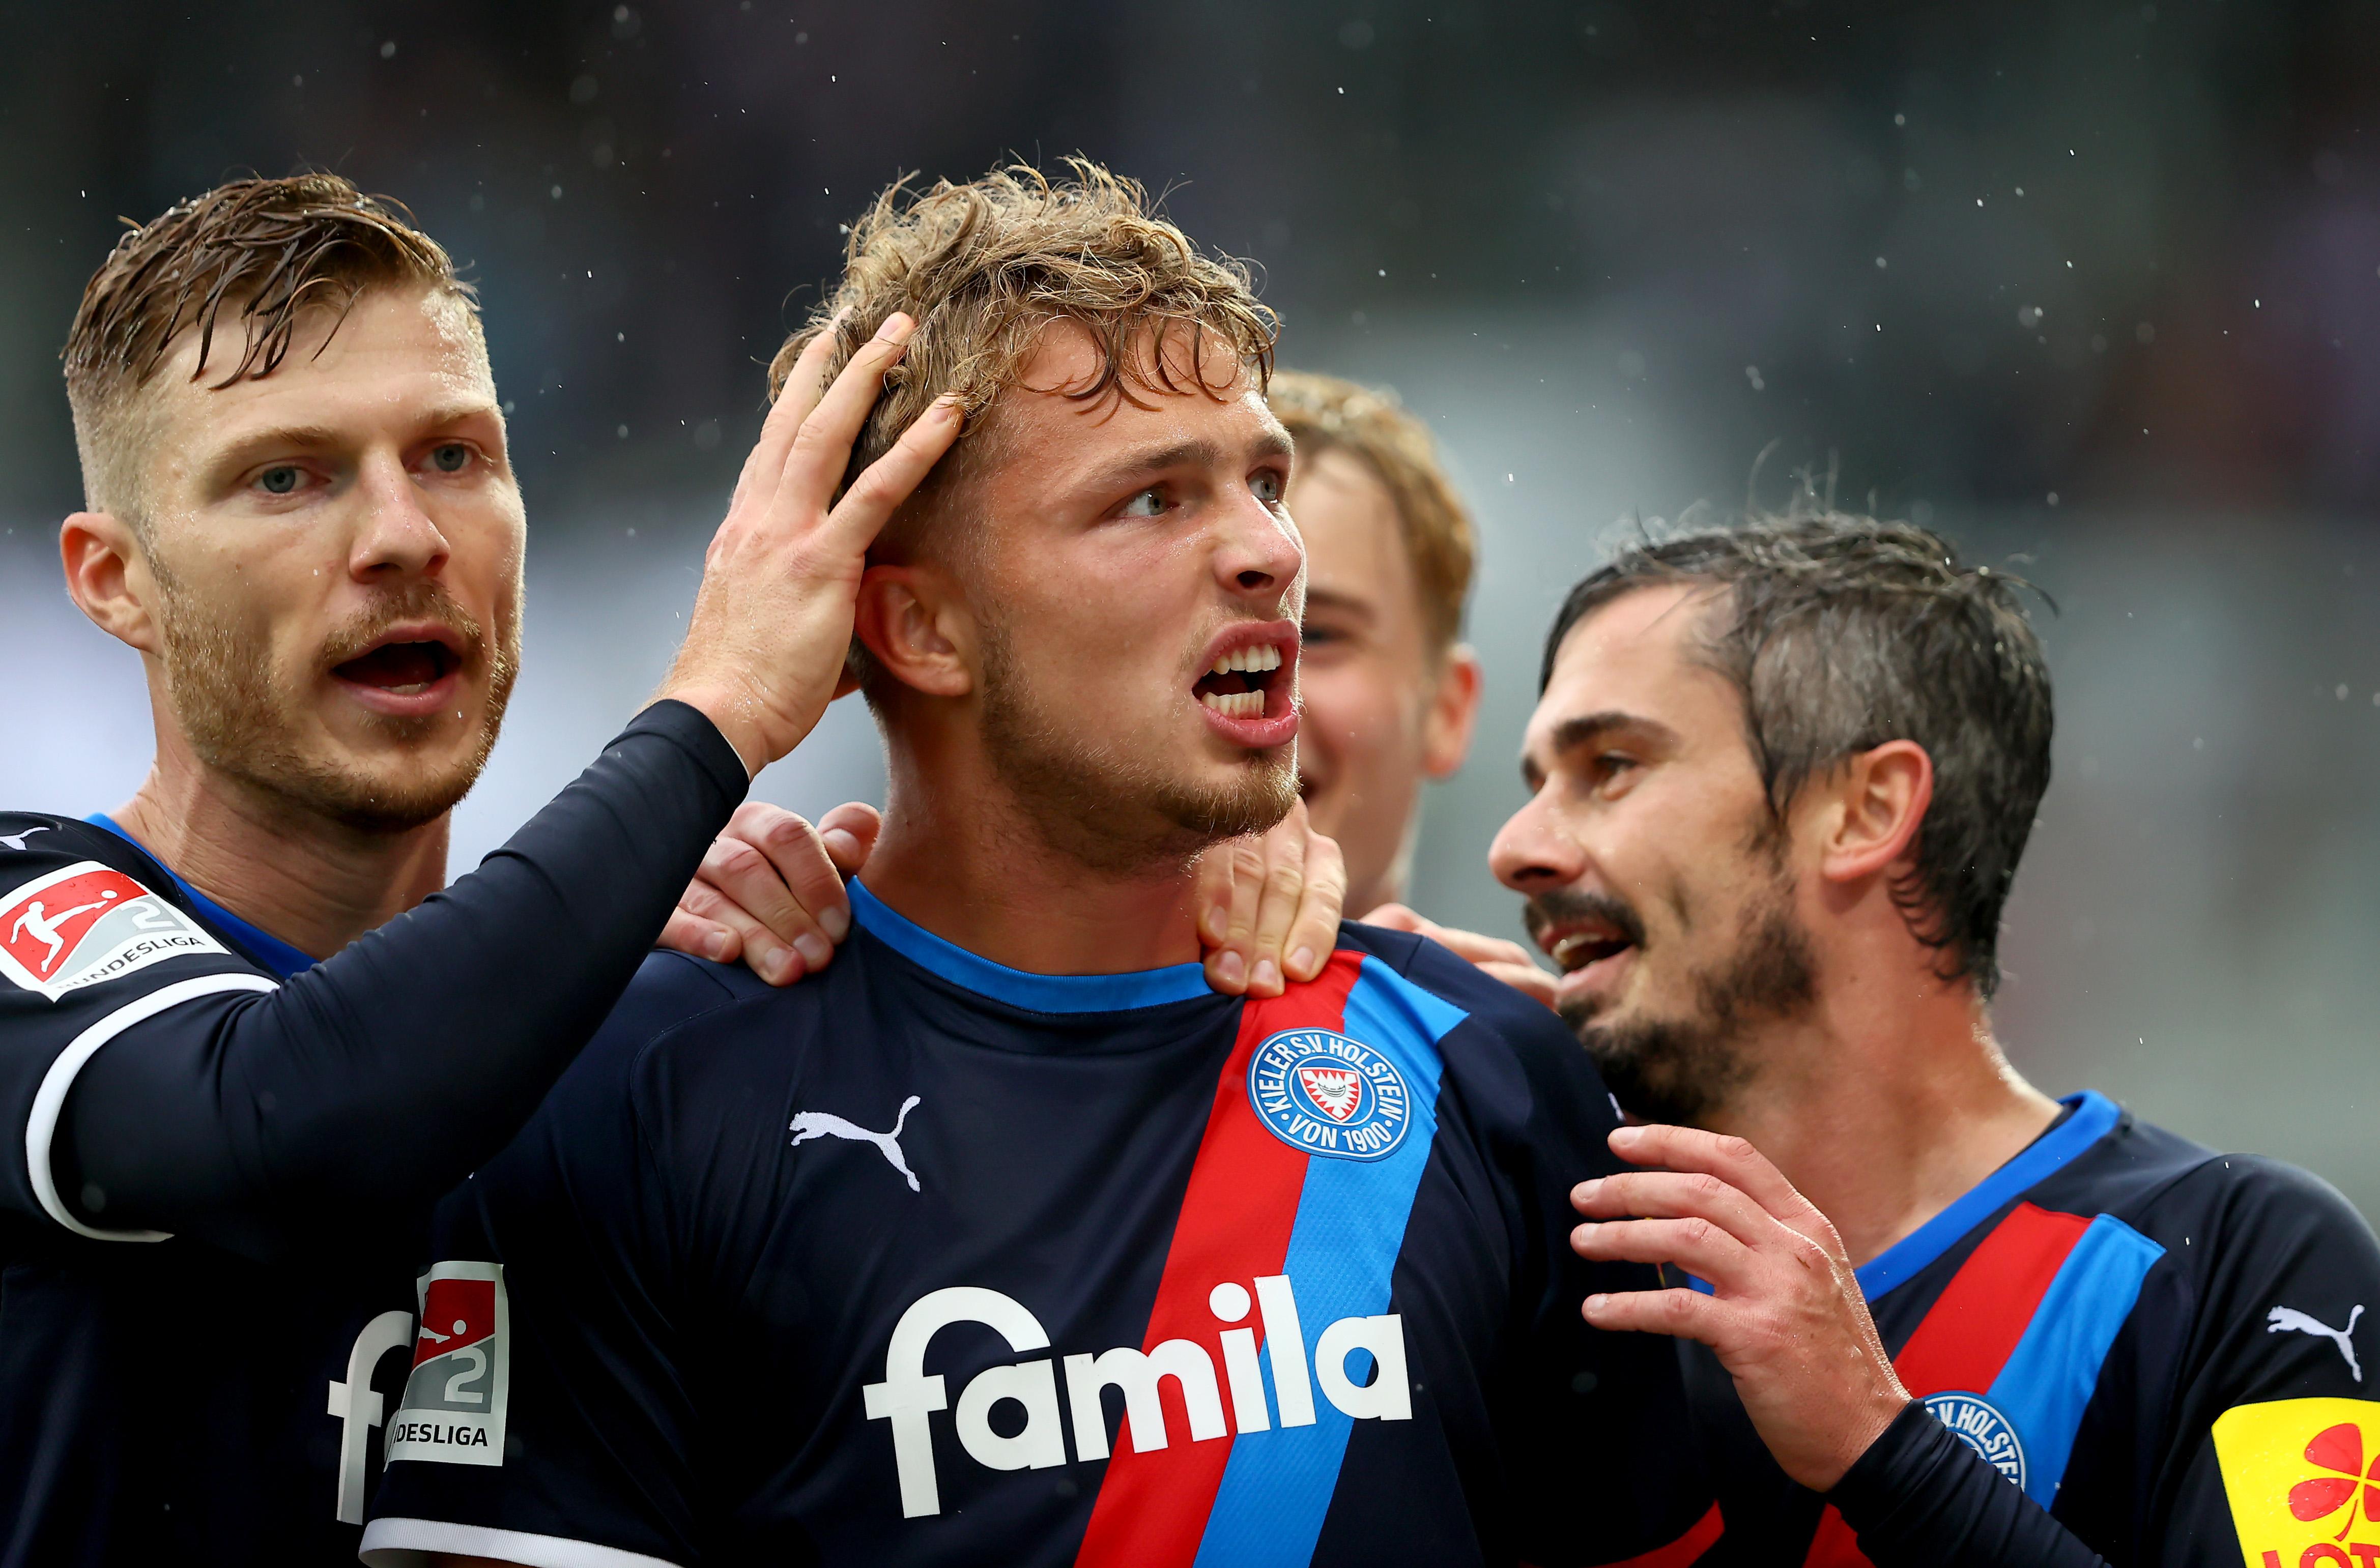 Holstein Kiel v FC Erzgebirge Aue - Second Bundesliga